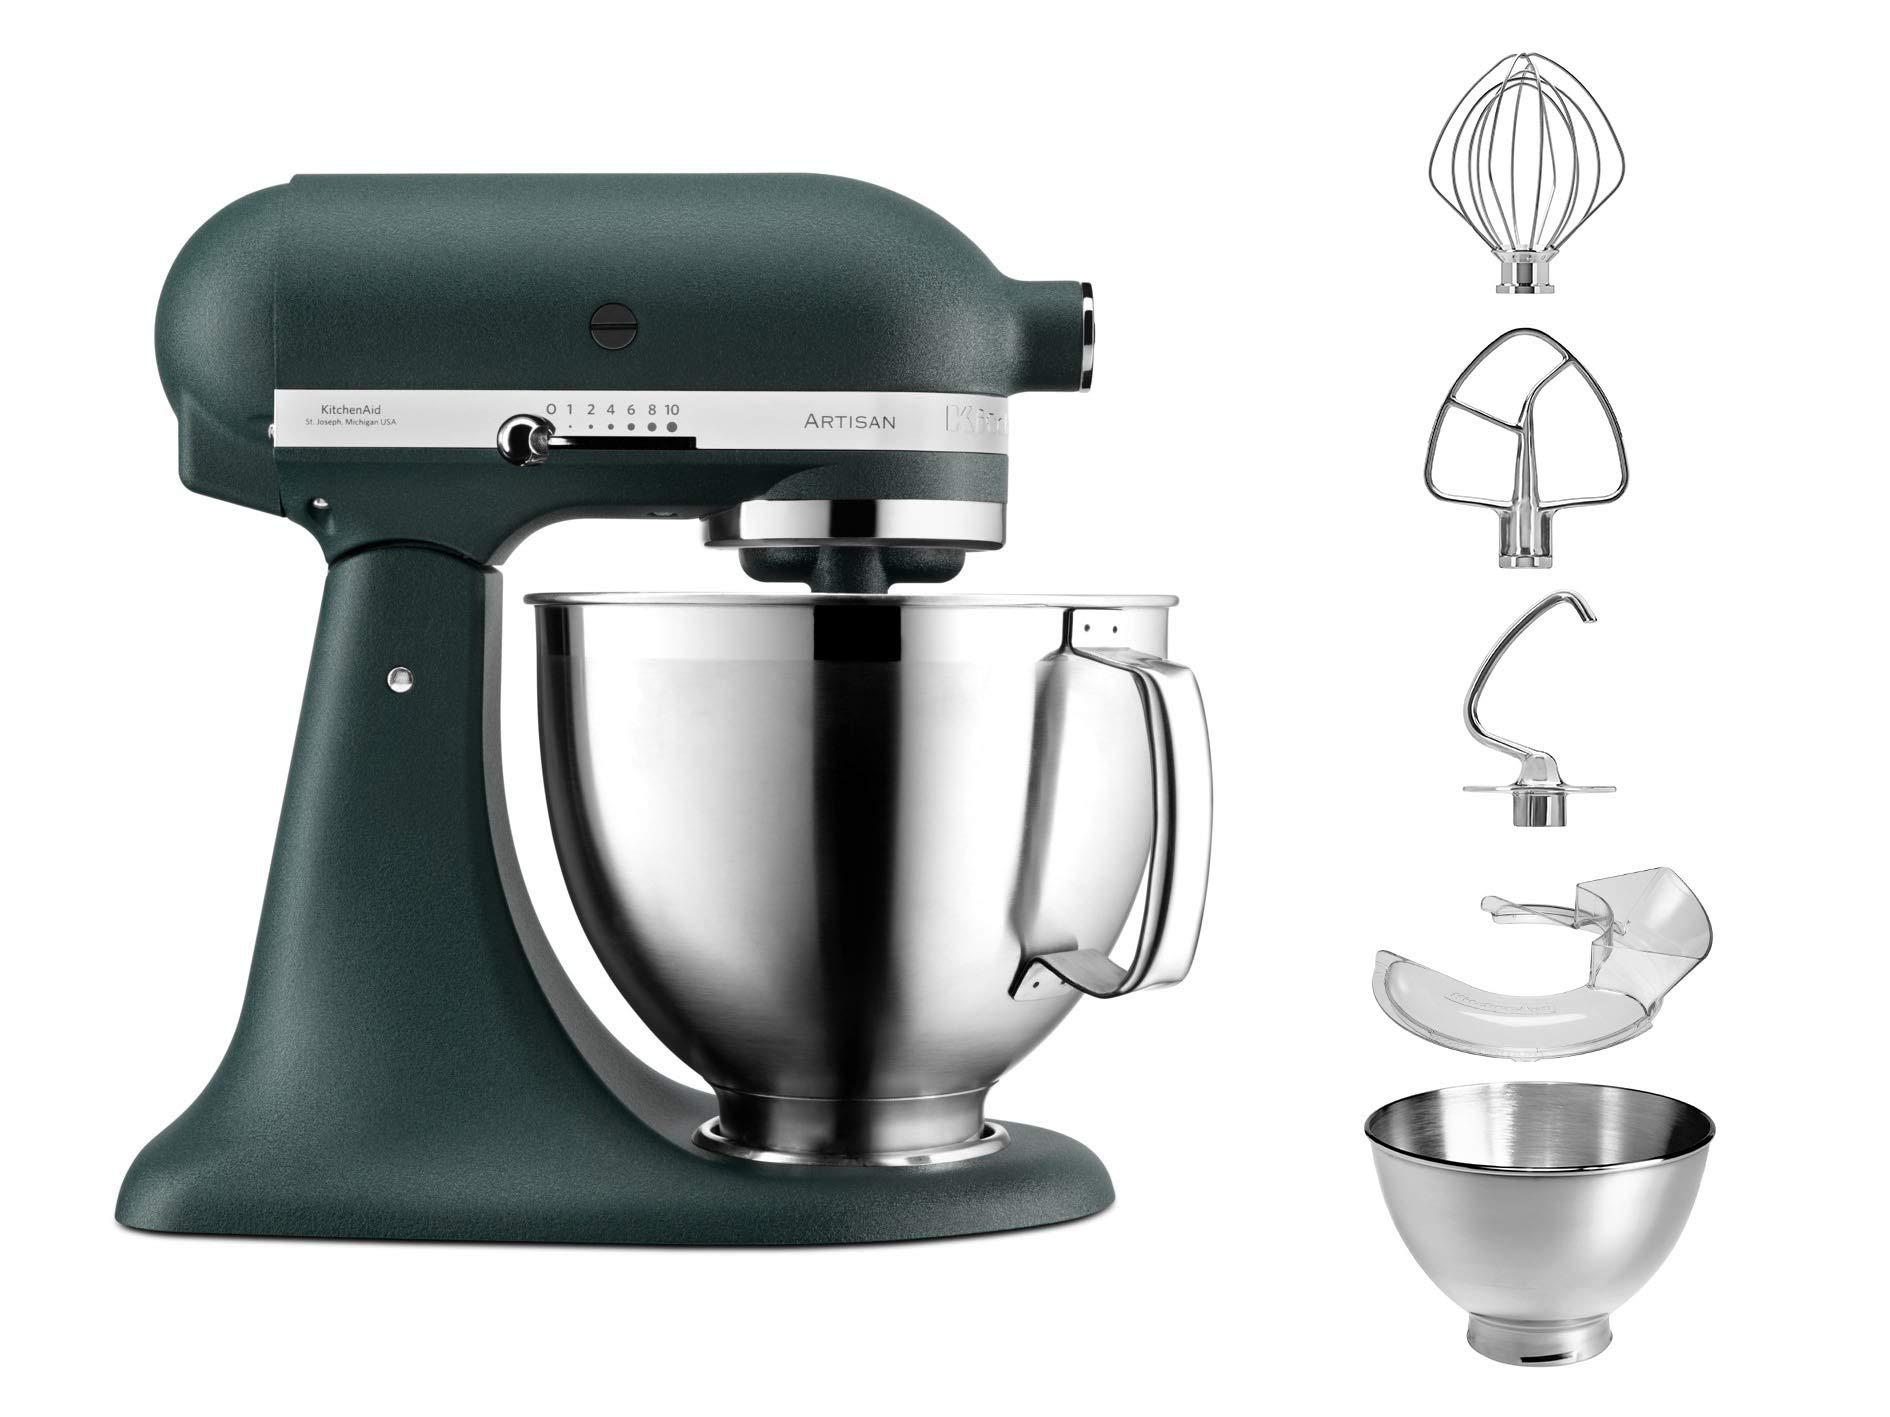 Kitchenaid 5KSM185PSEPP - Robot de cocina, acero inoxidable: Amazon.es: Hogar